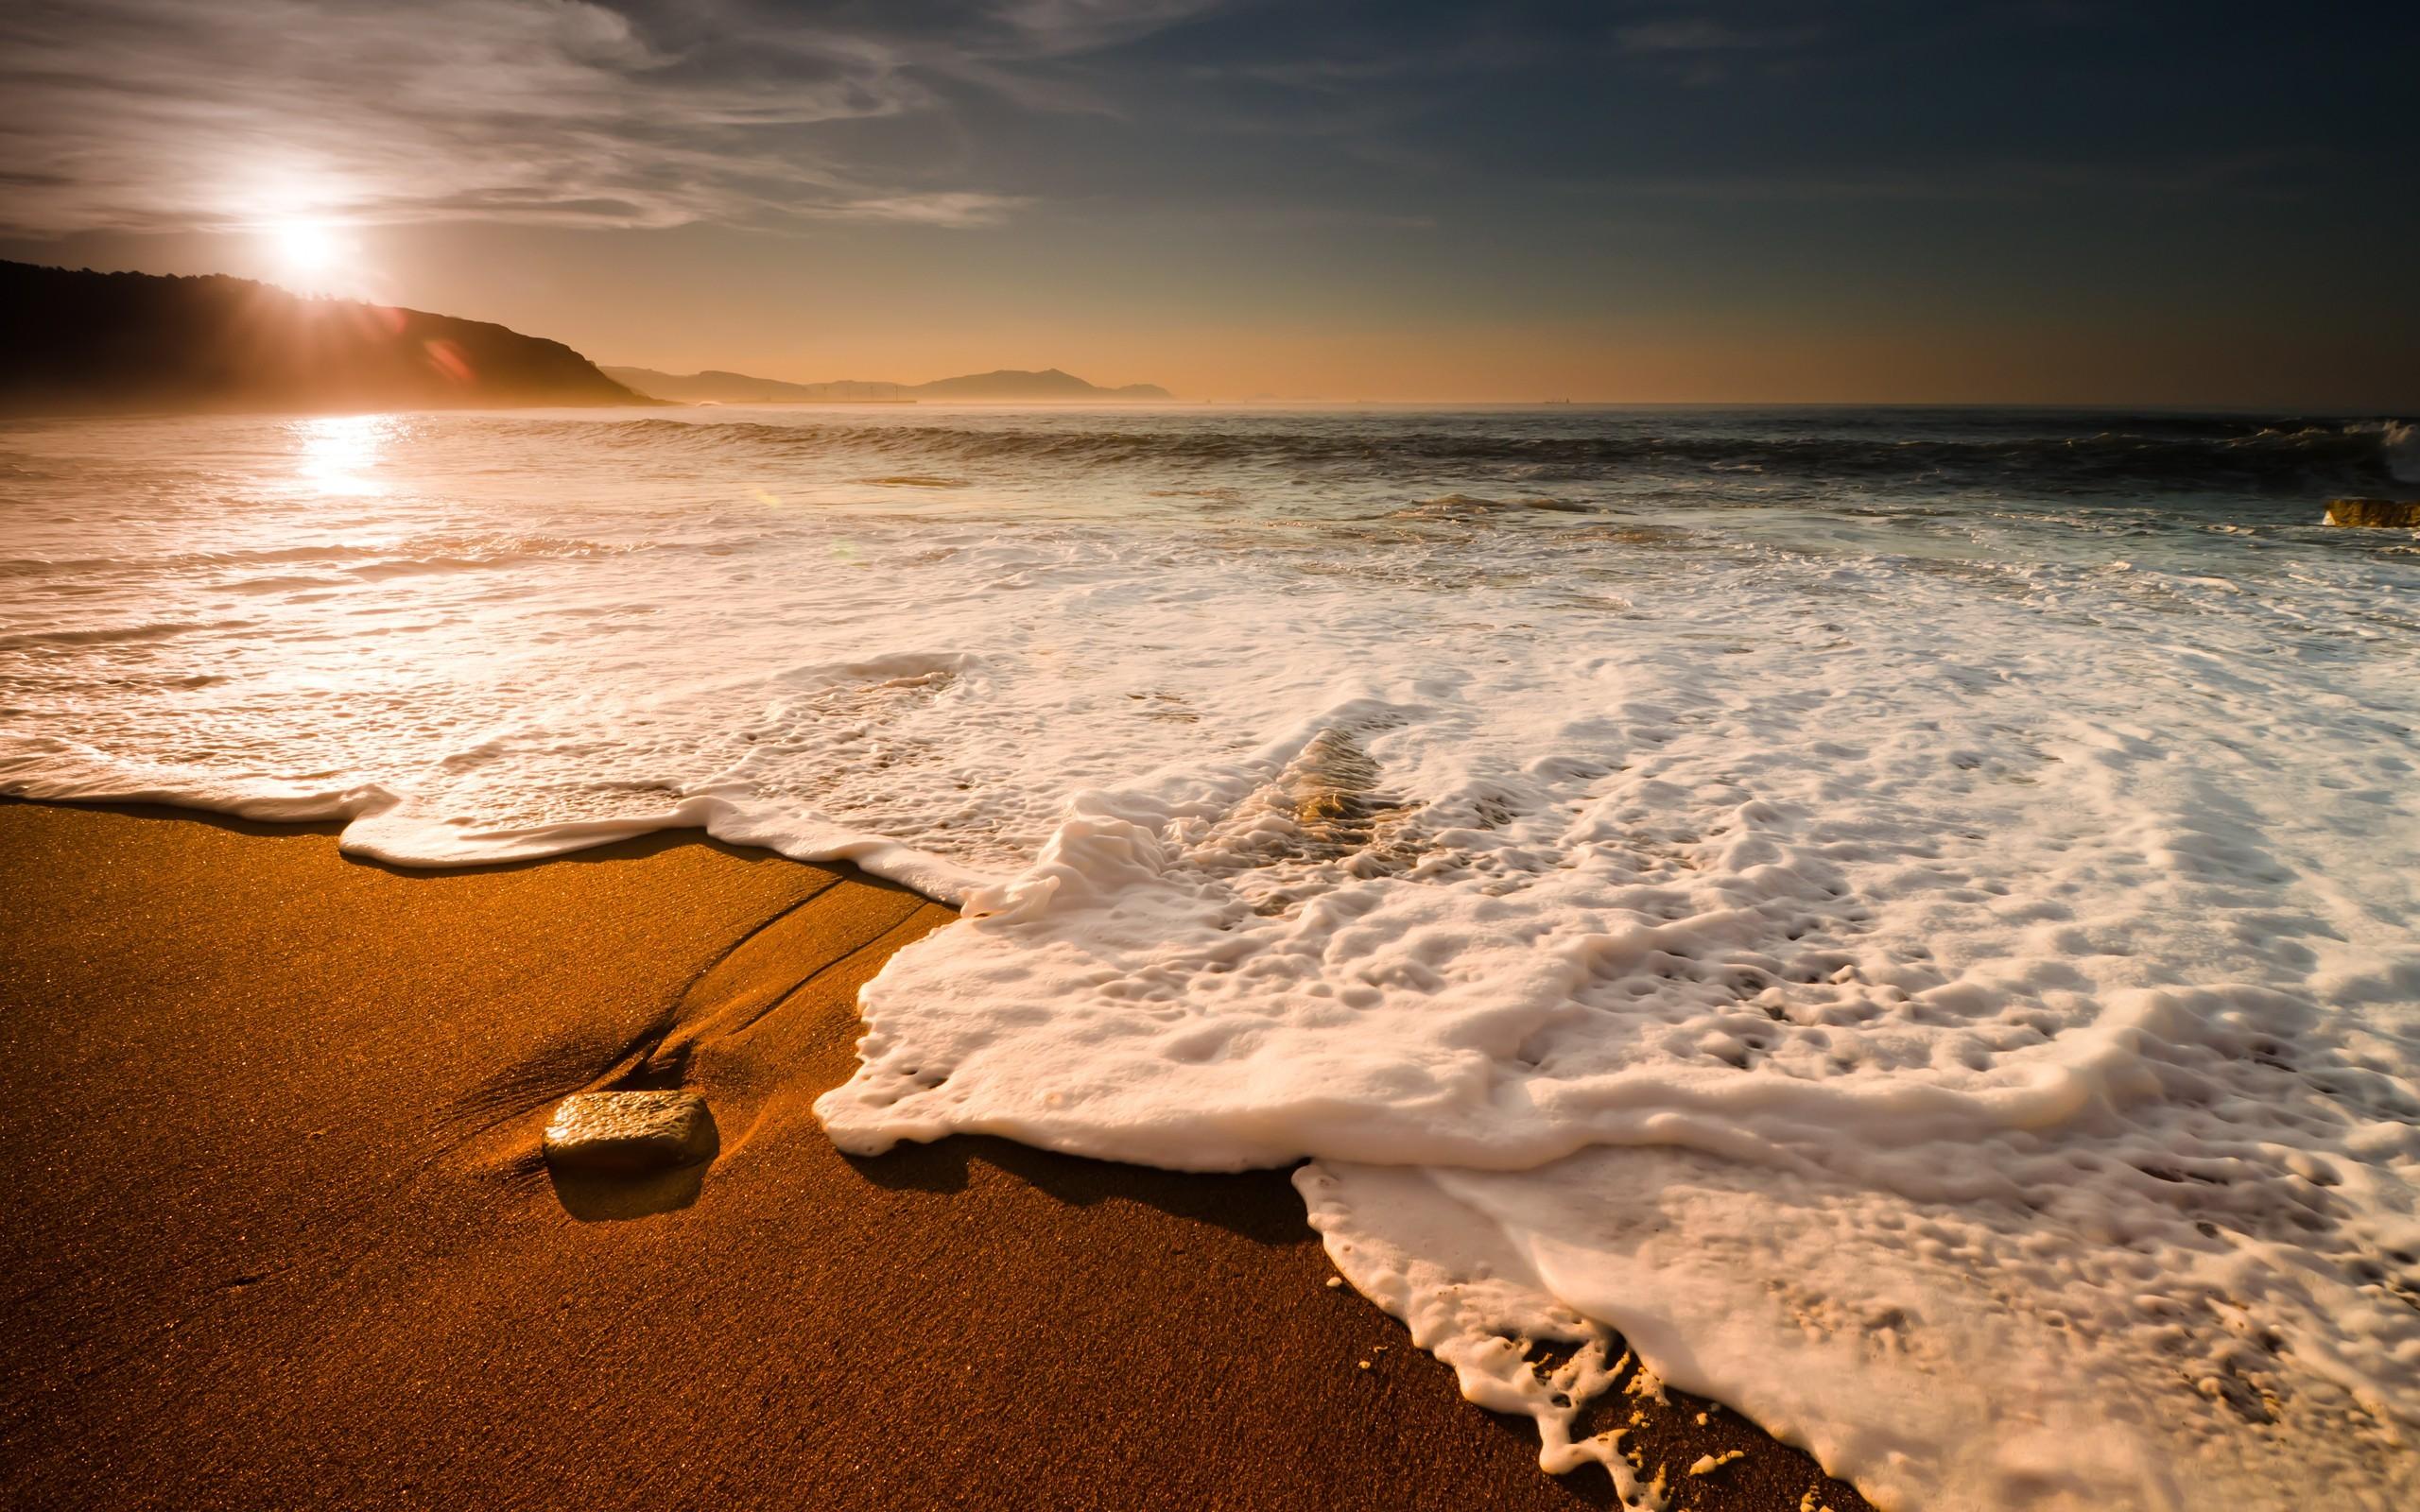 General 2560x1600 water beach sunset sky stones sea outdoors horizon stone